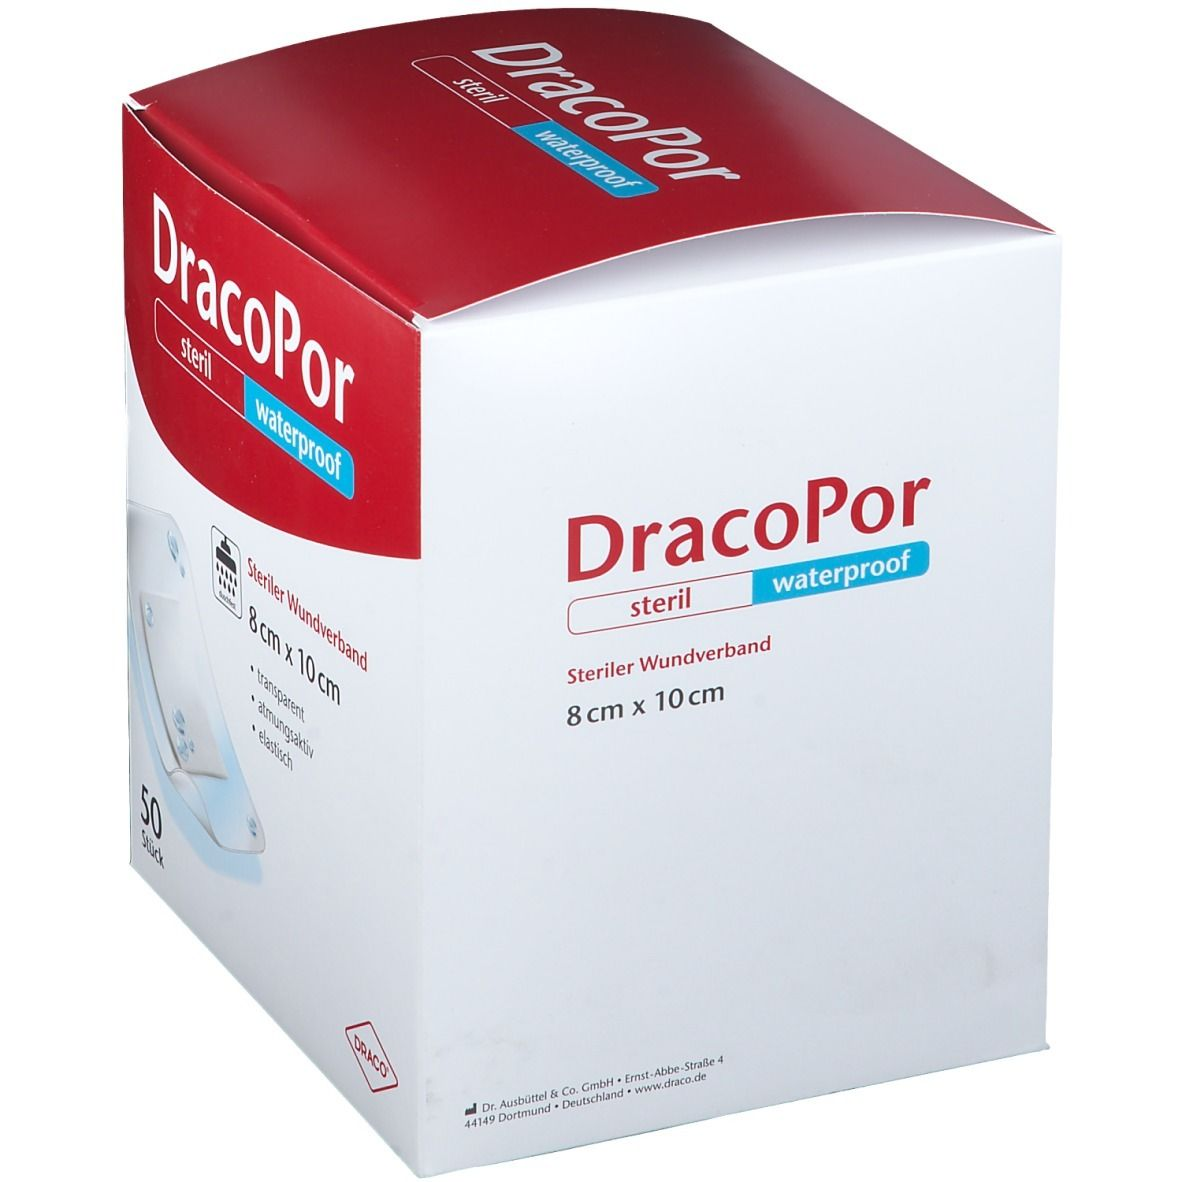 DracoPor Waterproof Wundverband steril 8 x 10 cm